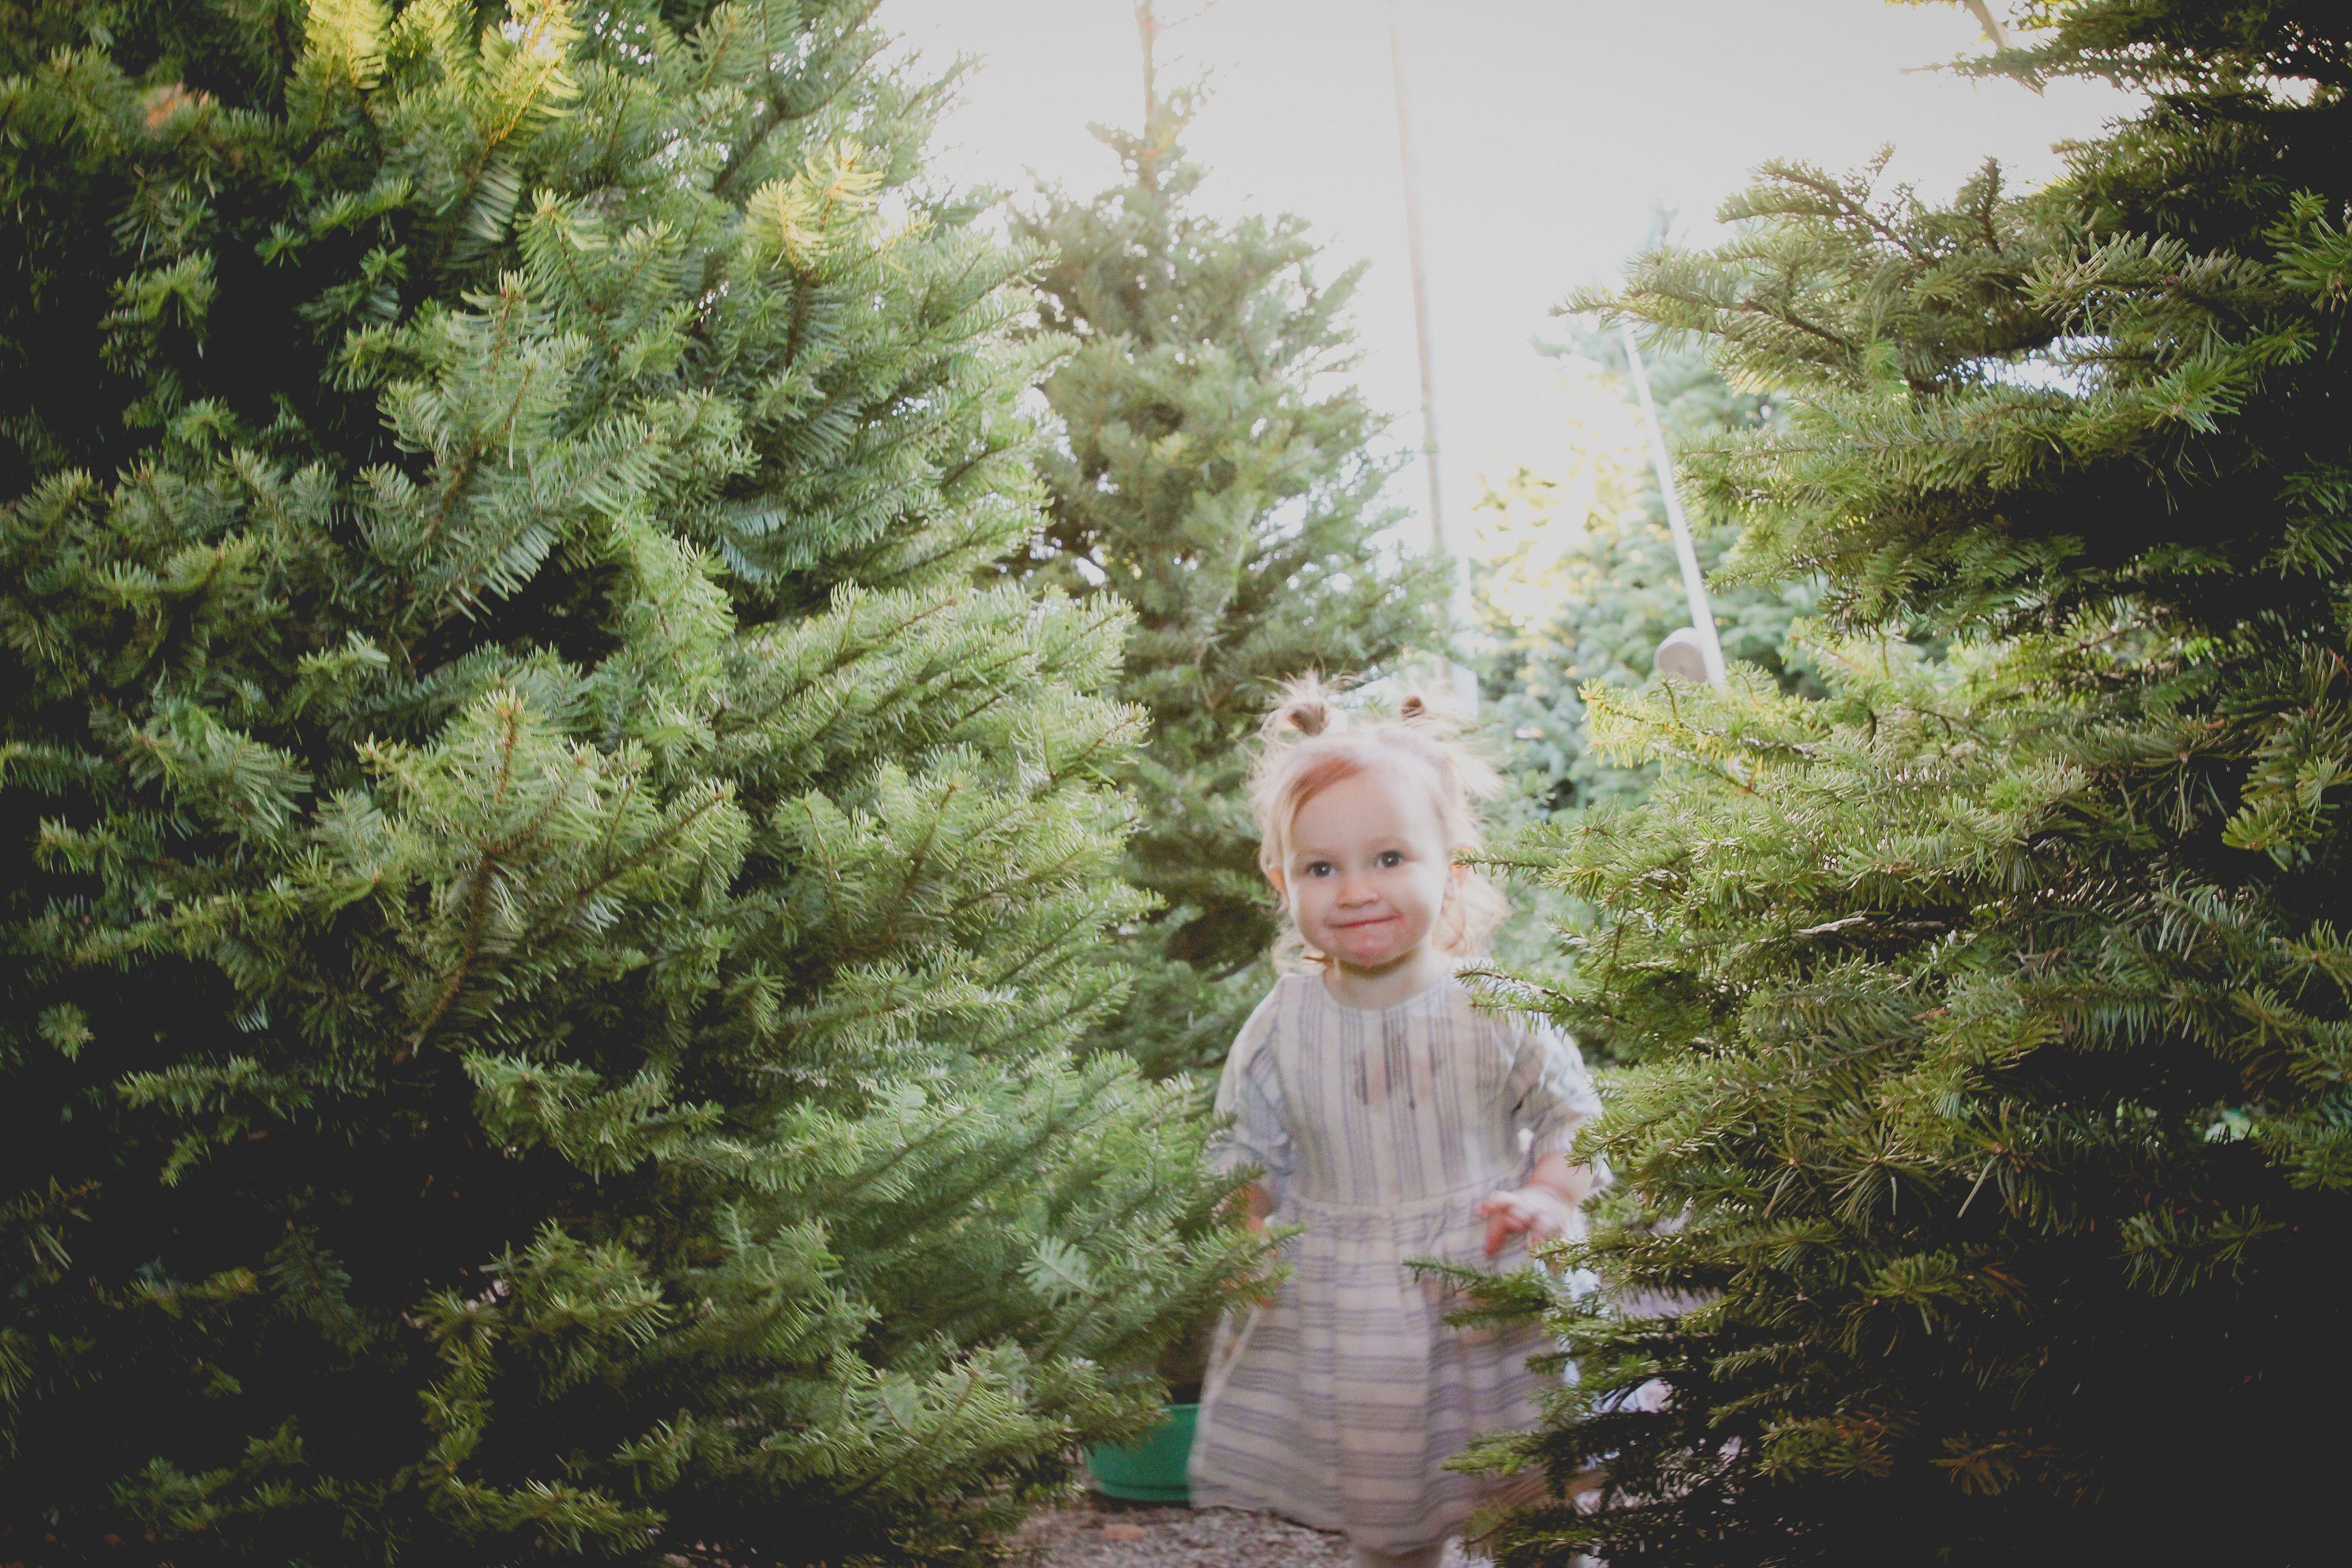 Phoenix Christmas Tree Farm Photoshoot Christmas Tree Farm Photo Shoot Christmas Tree Farm Photography